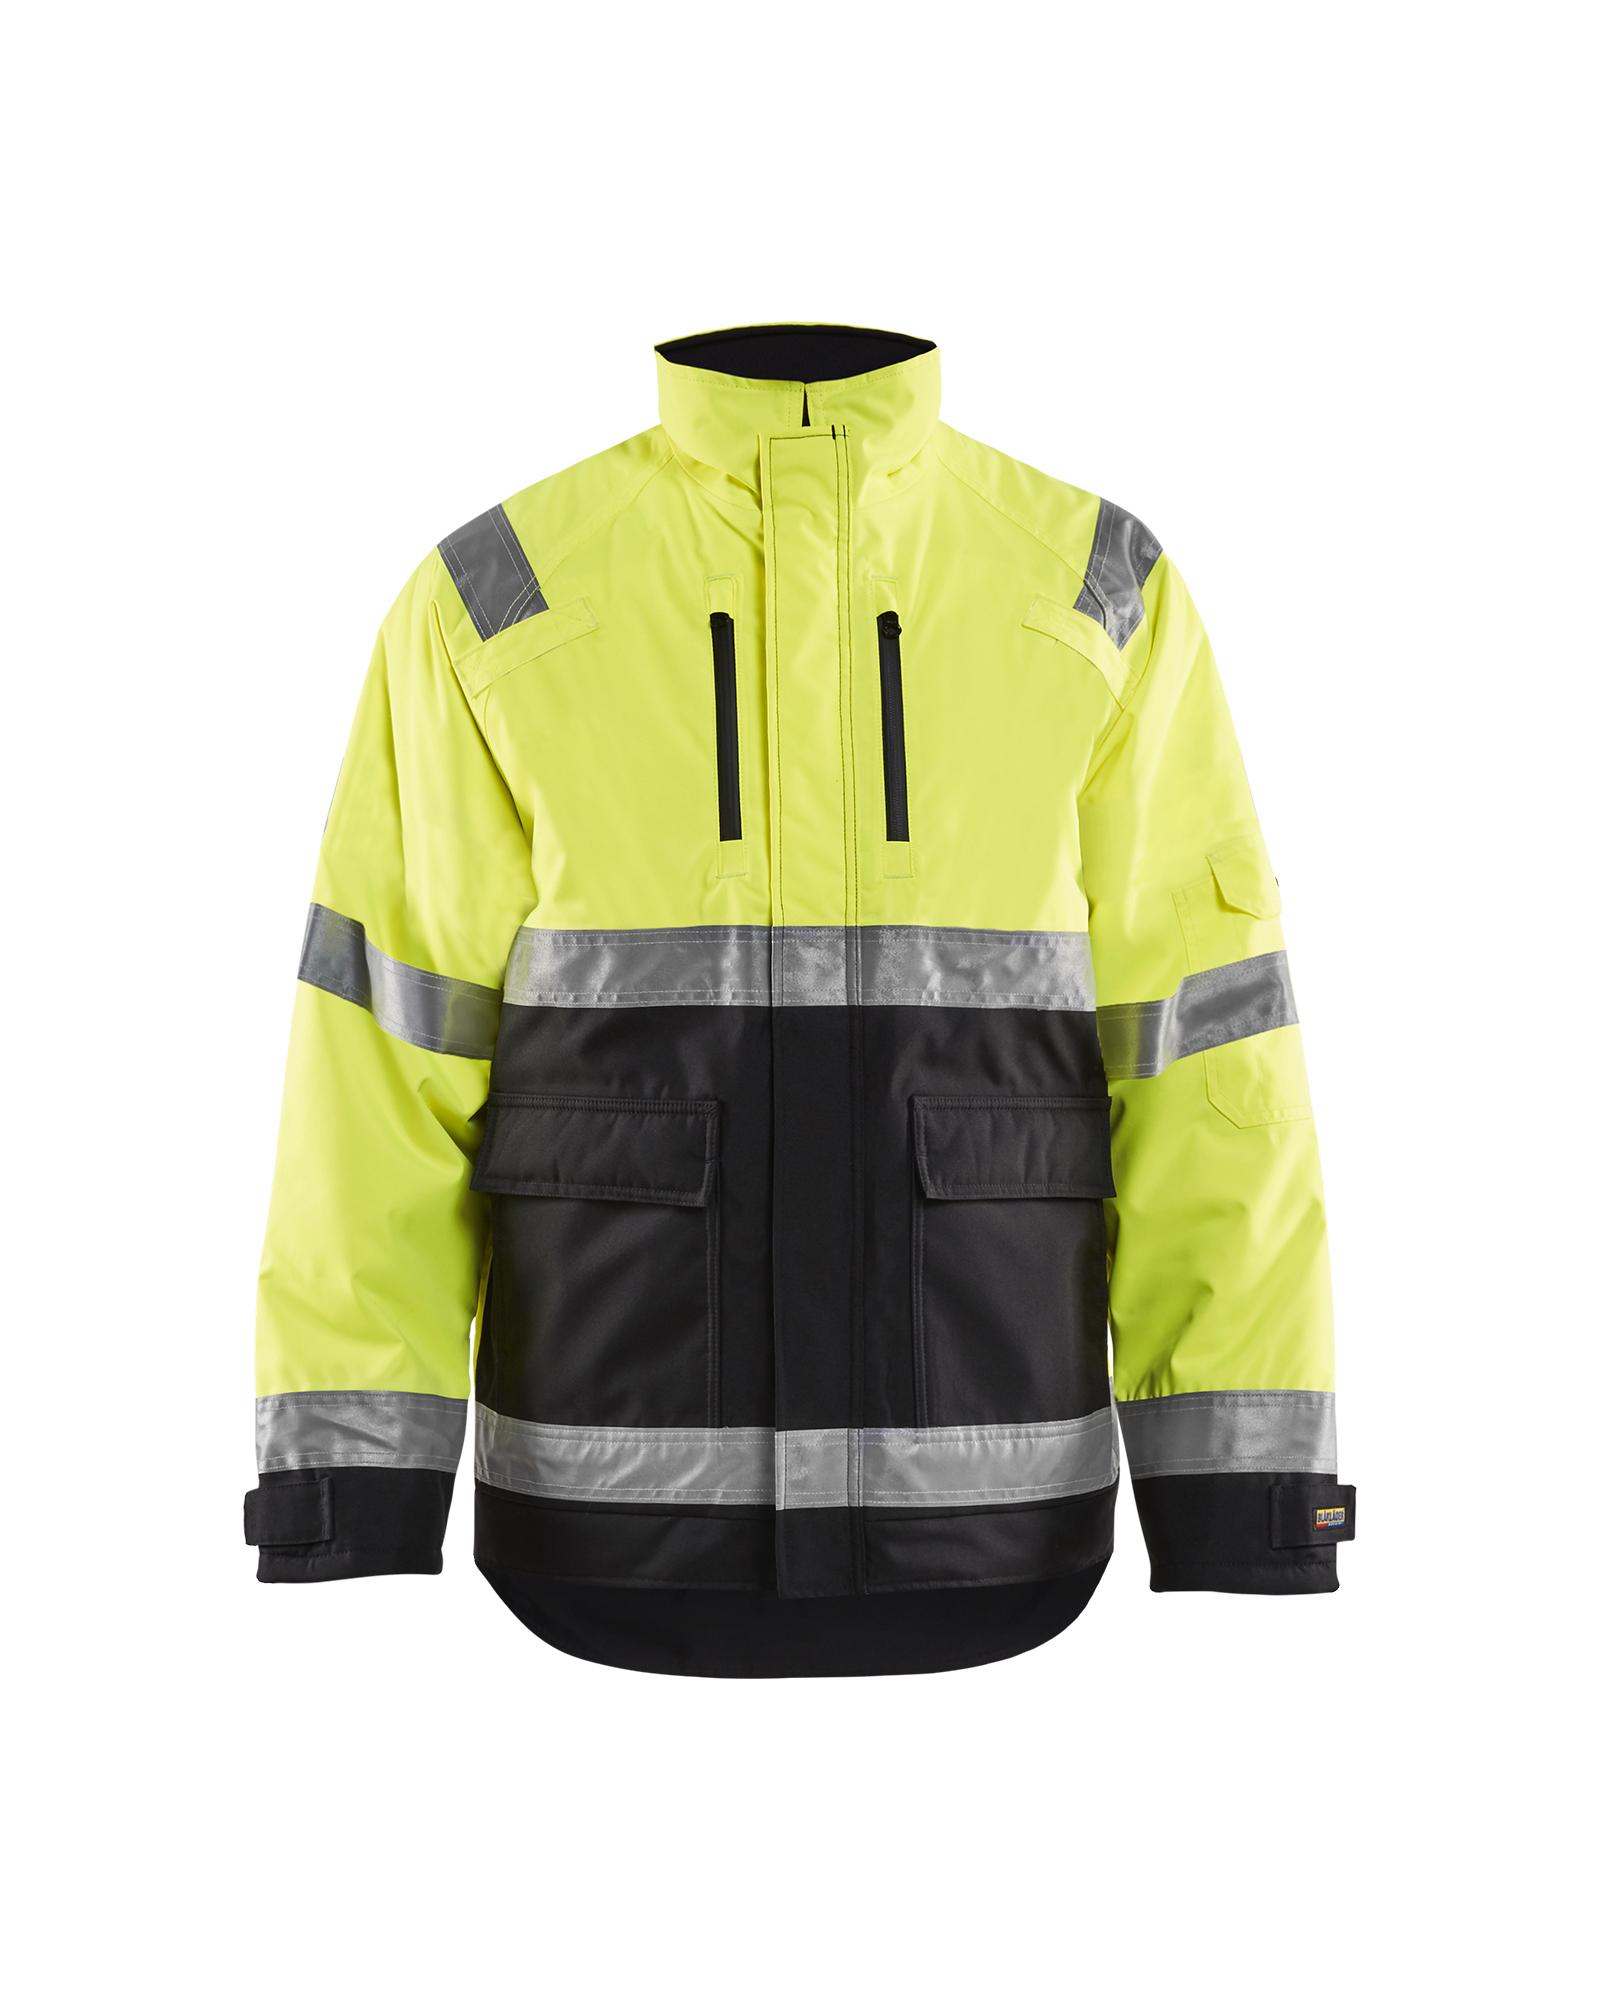 Blaklader Workwear Fleece Jacket Black//Yellow XXXL